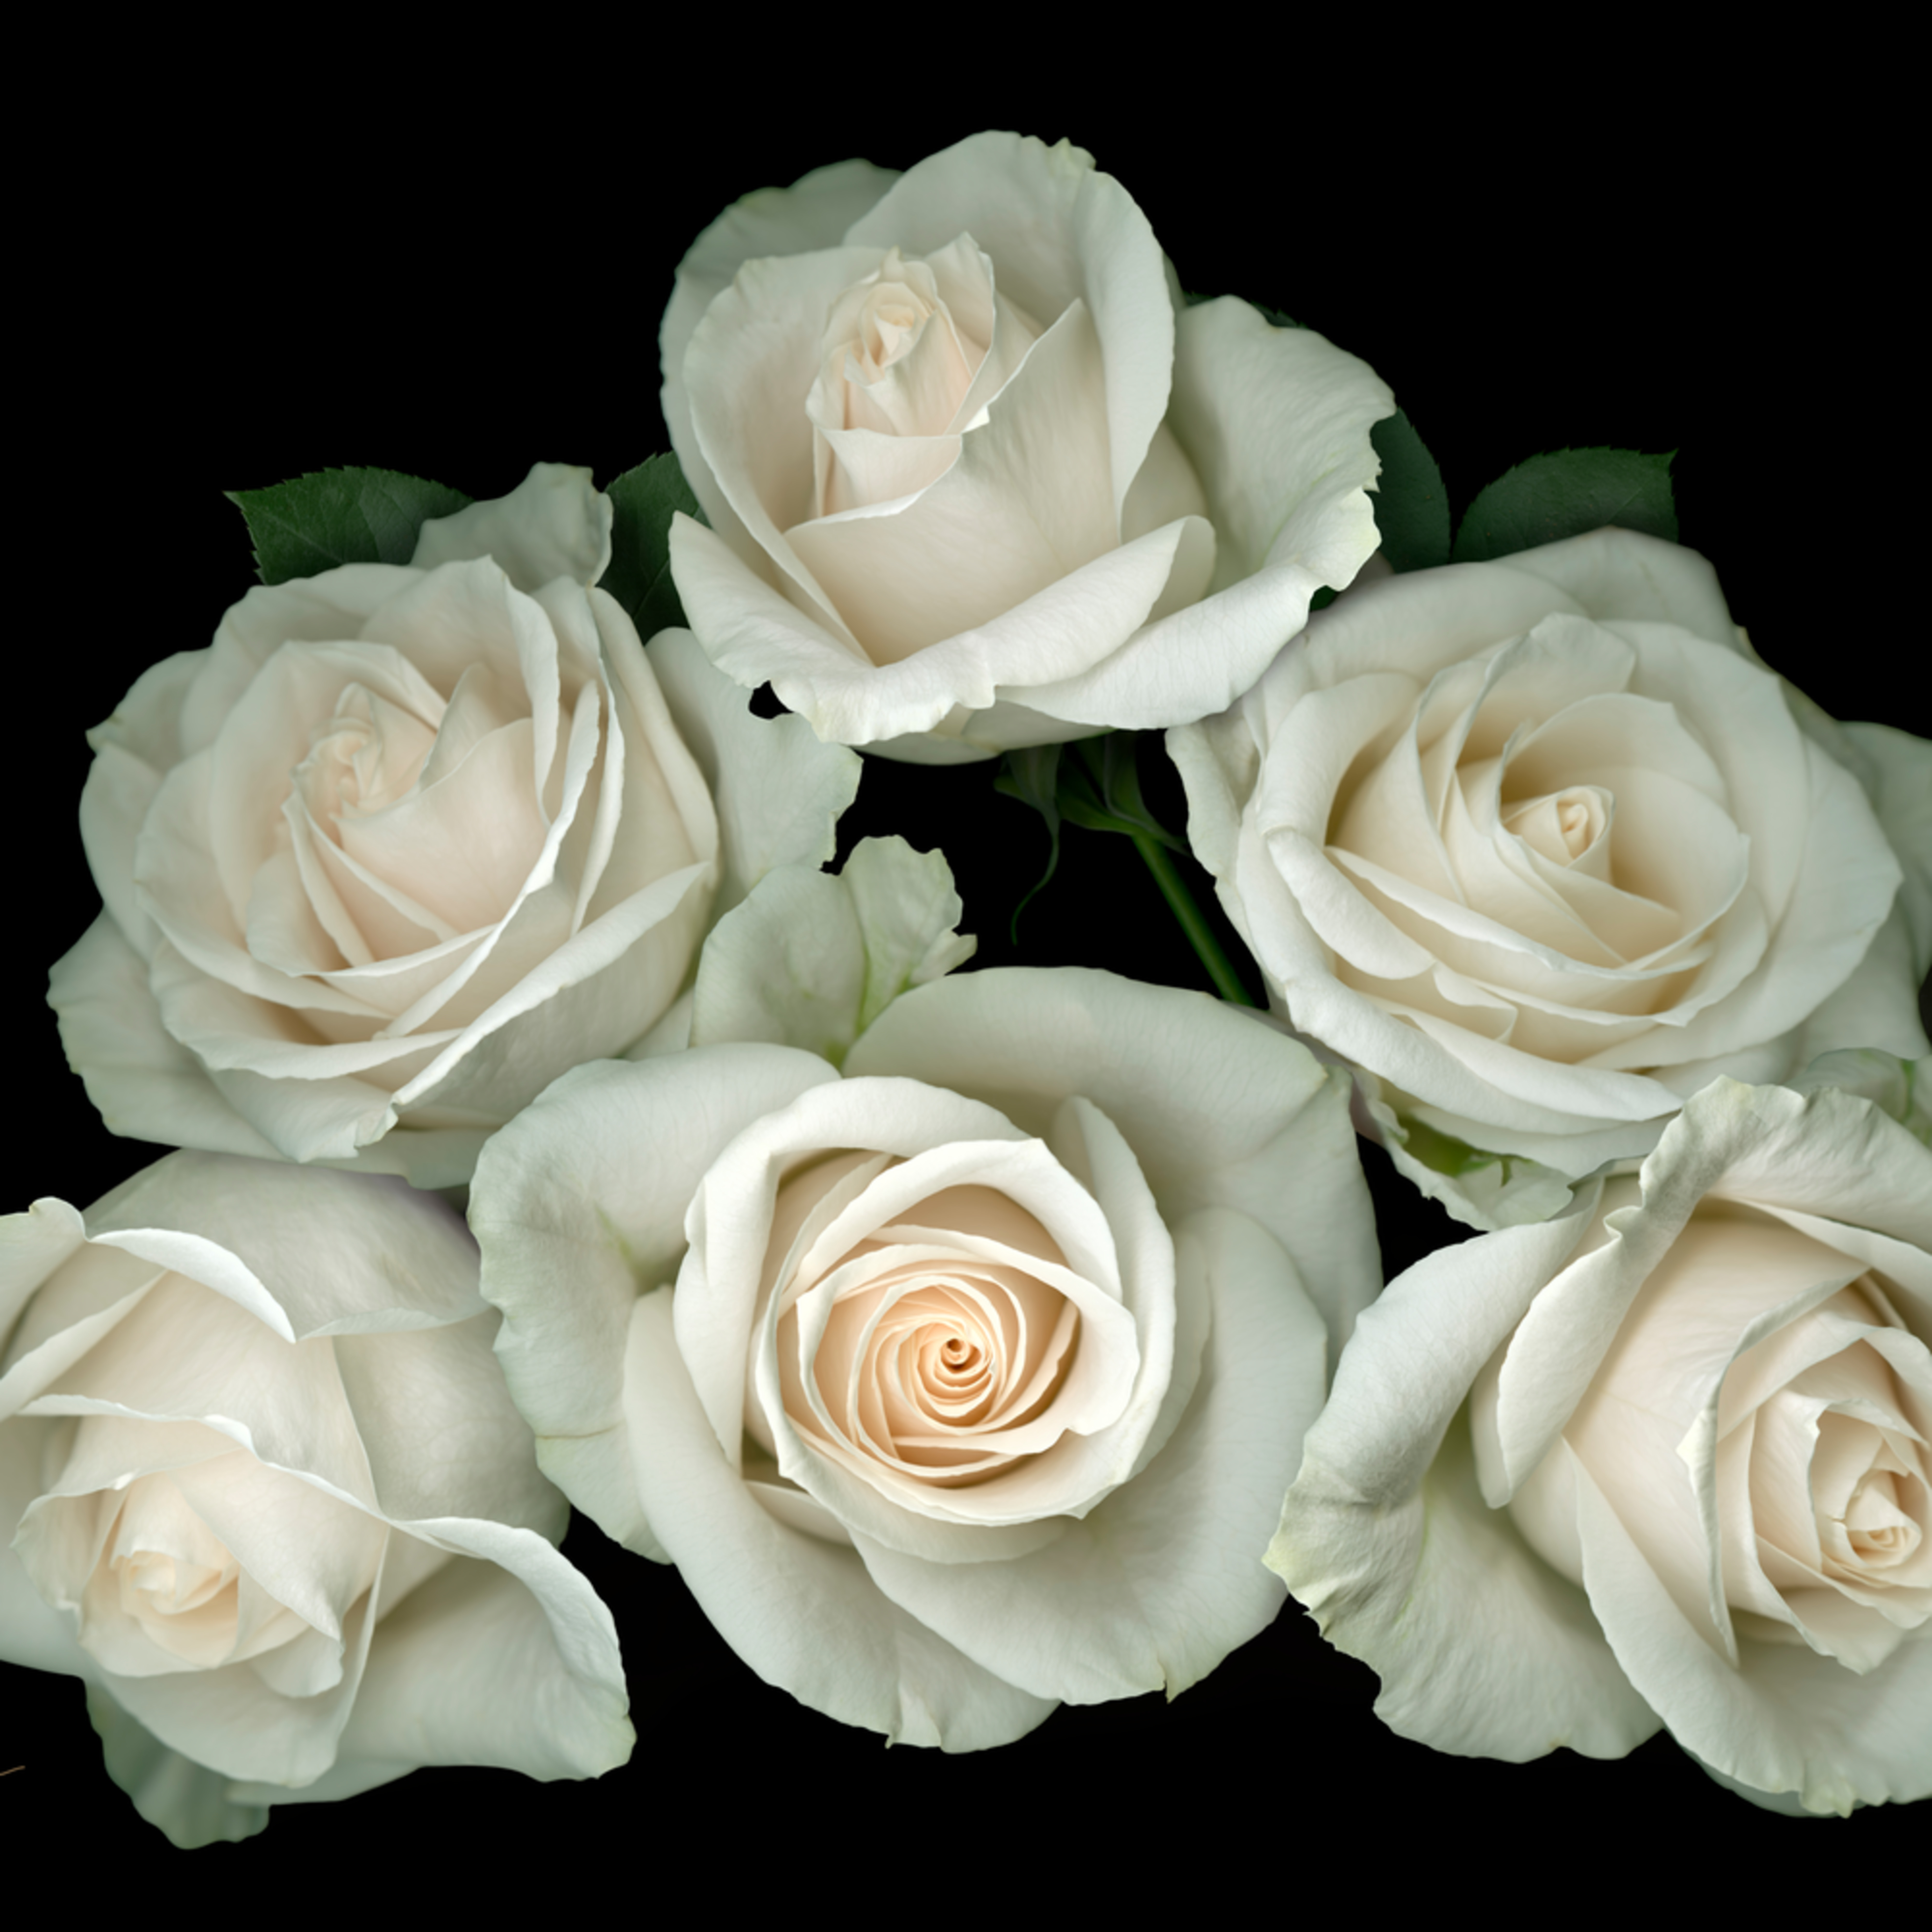 080101 ahern white rose pyramid black bgd iuxlpo